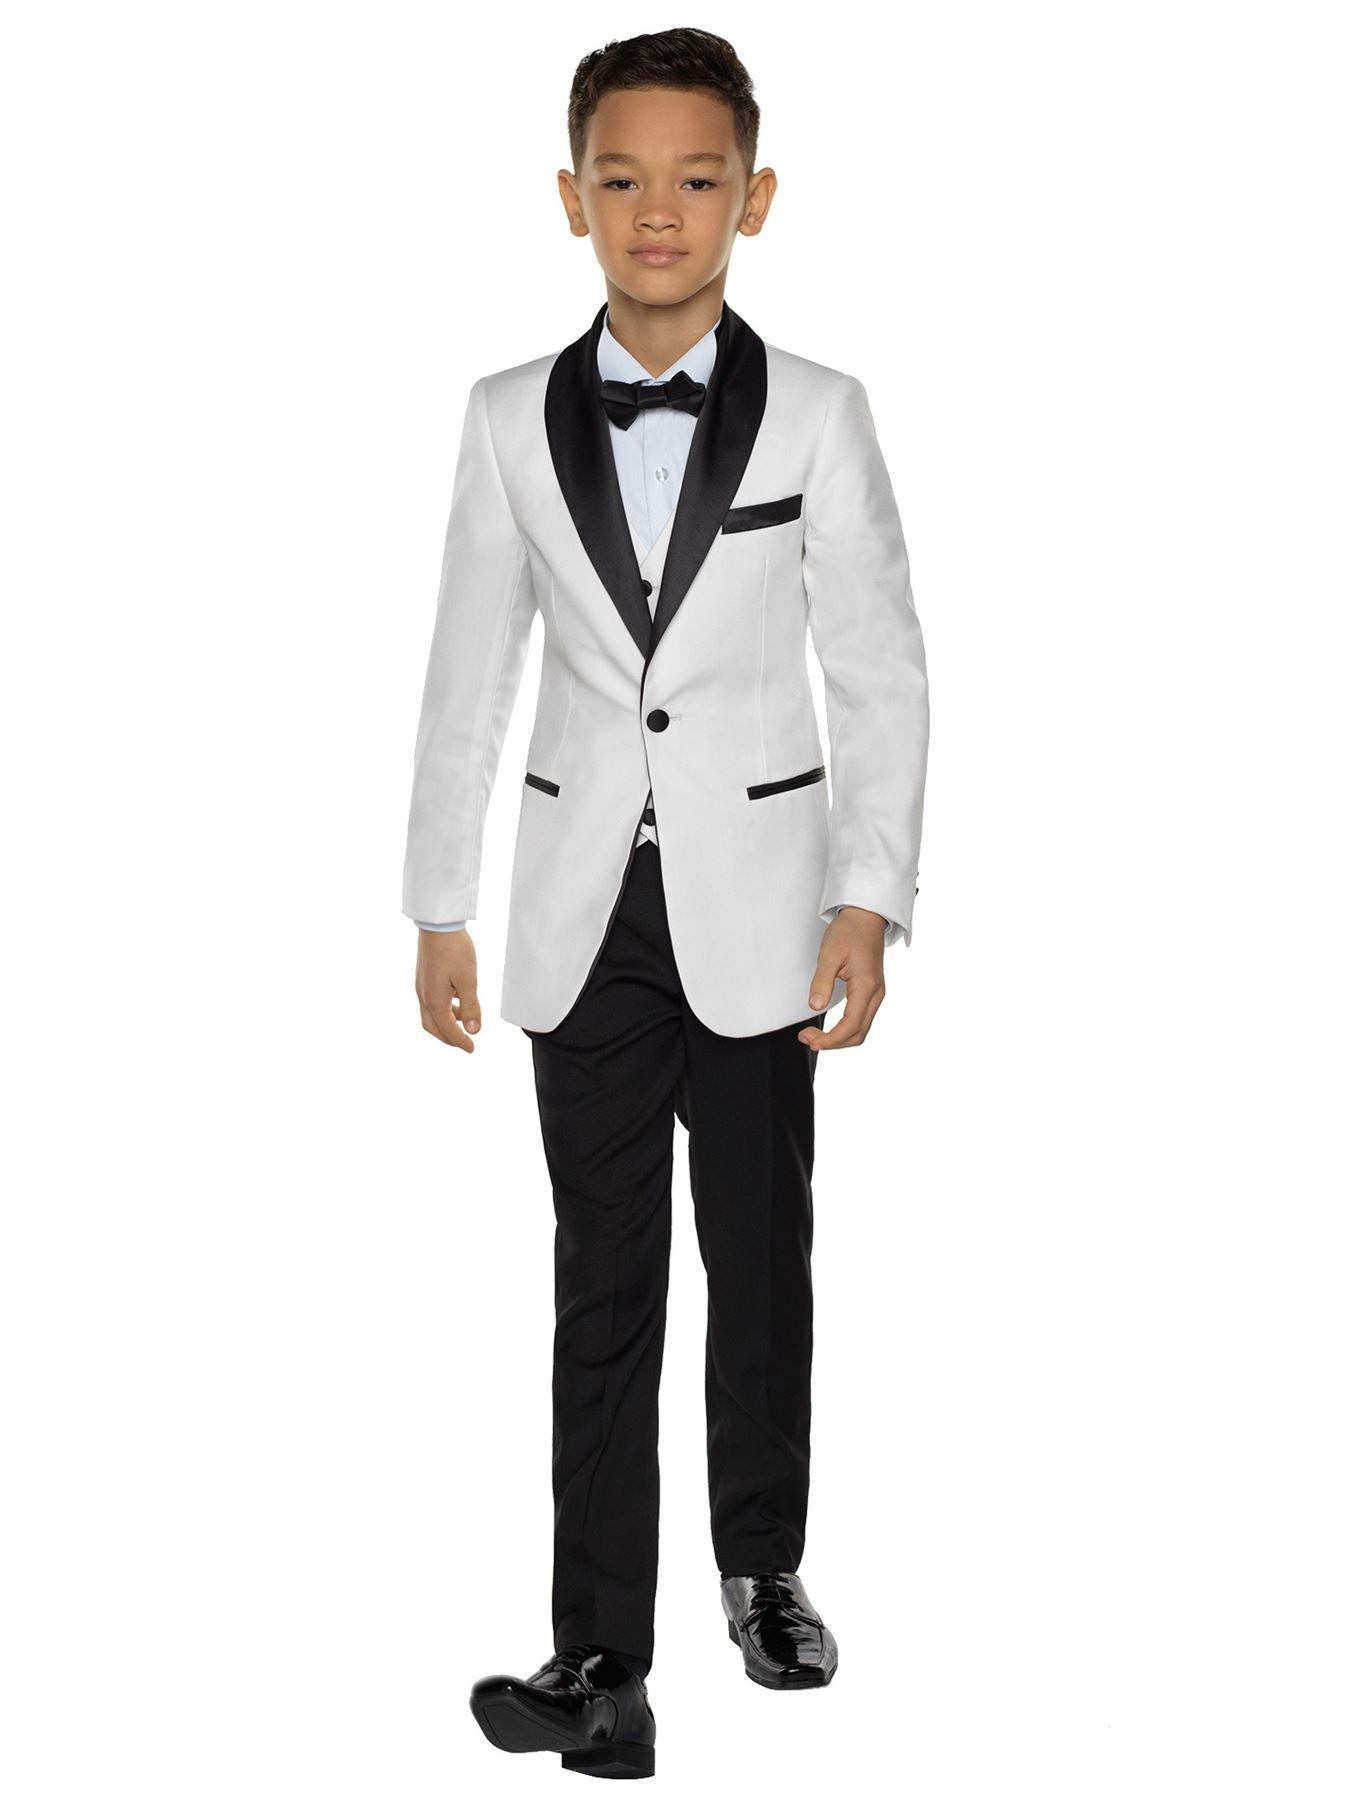 Paisley of London, Porter Ivory Slim Fit Tuxedo, Boys Formal Occasion Wear Set, 12